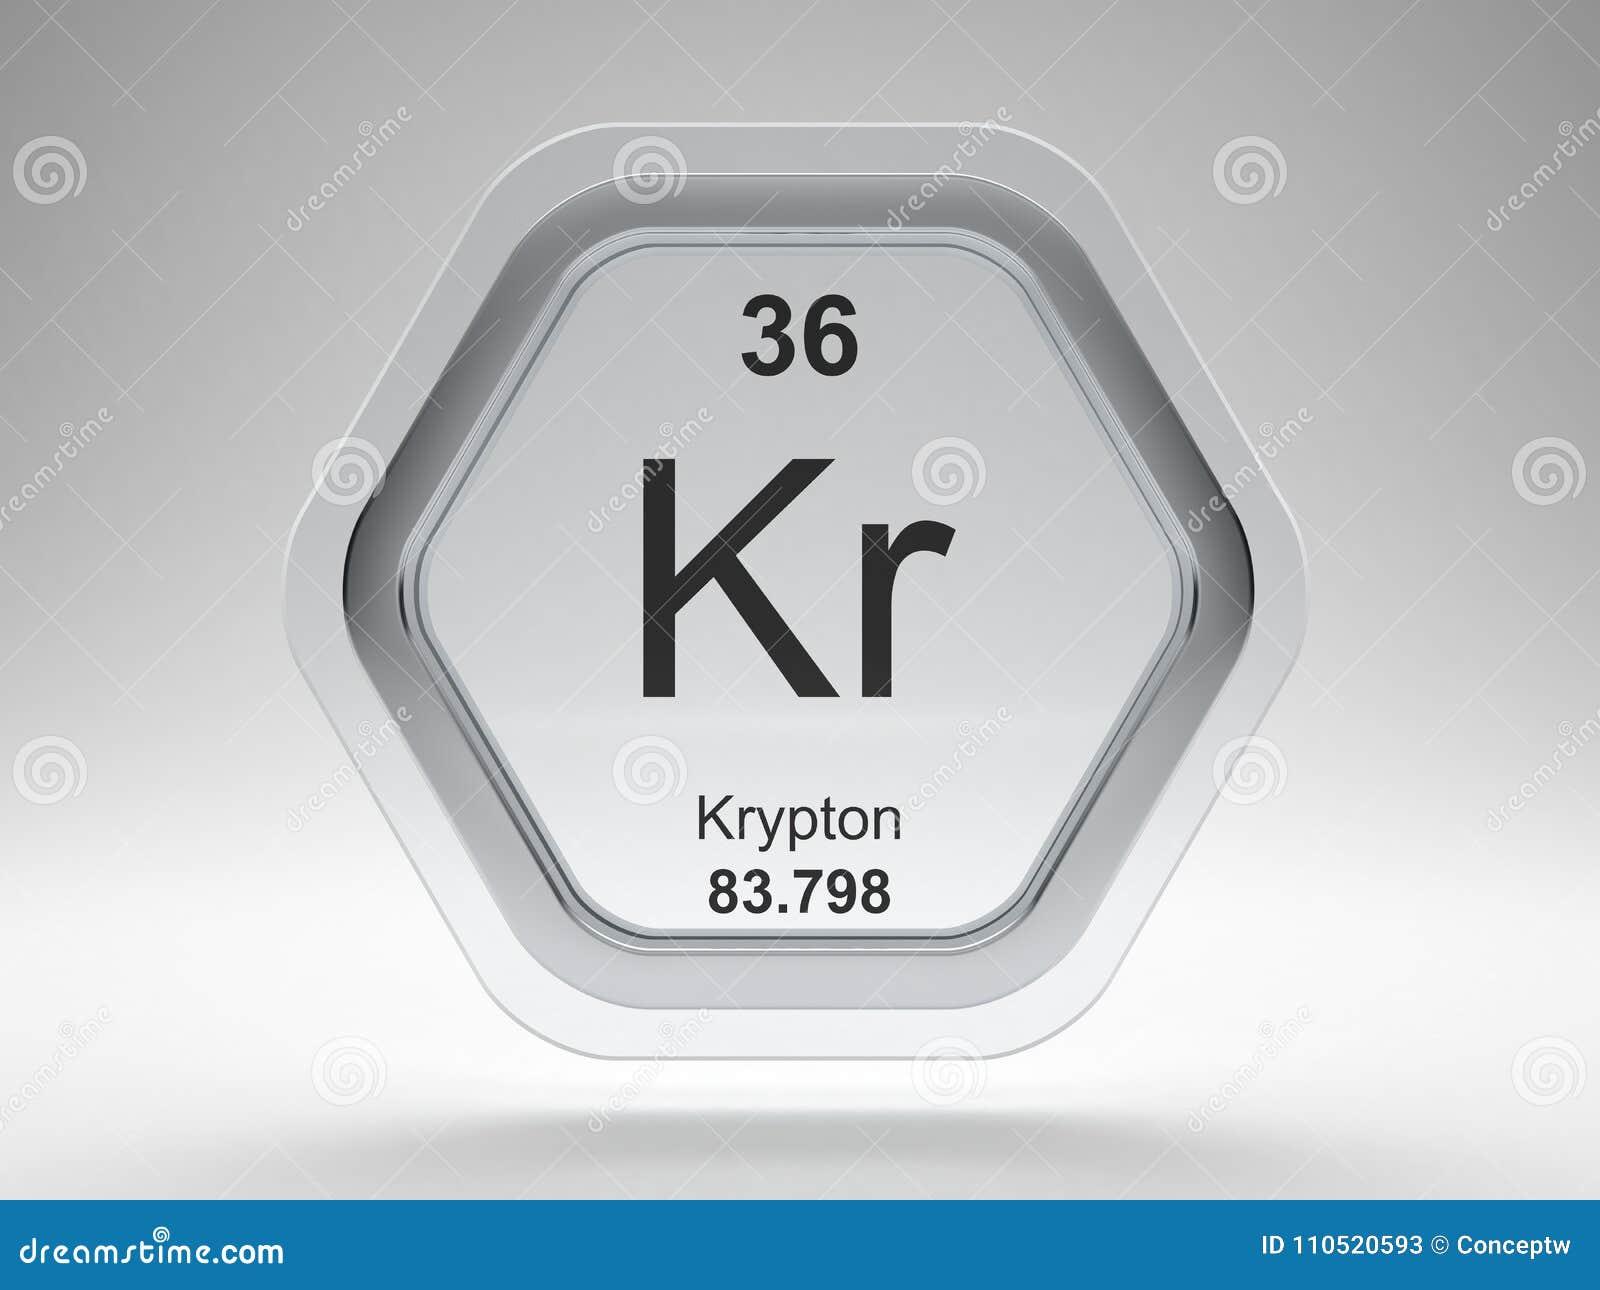 Krypton symbol on modern glass and steel icon stock illustration krypton symbol from periodic table on modern glass and steel icon urtaz Gallery